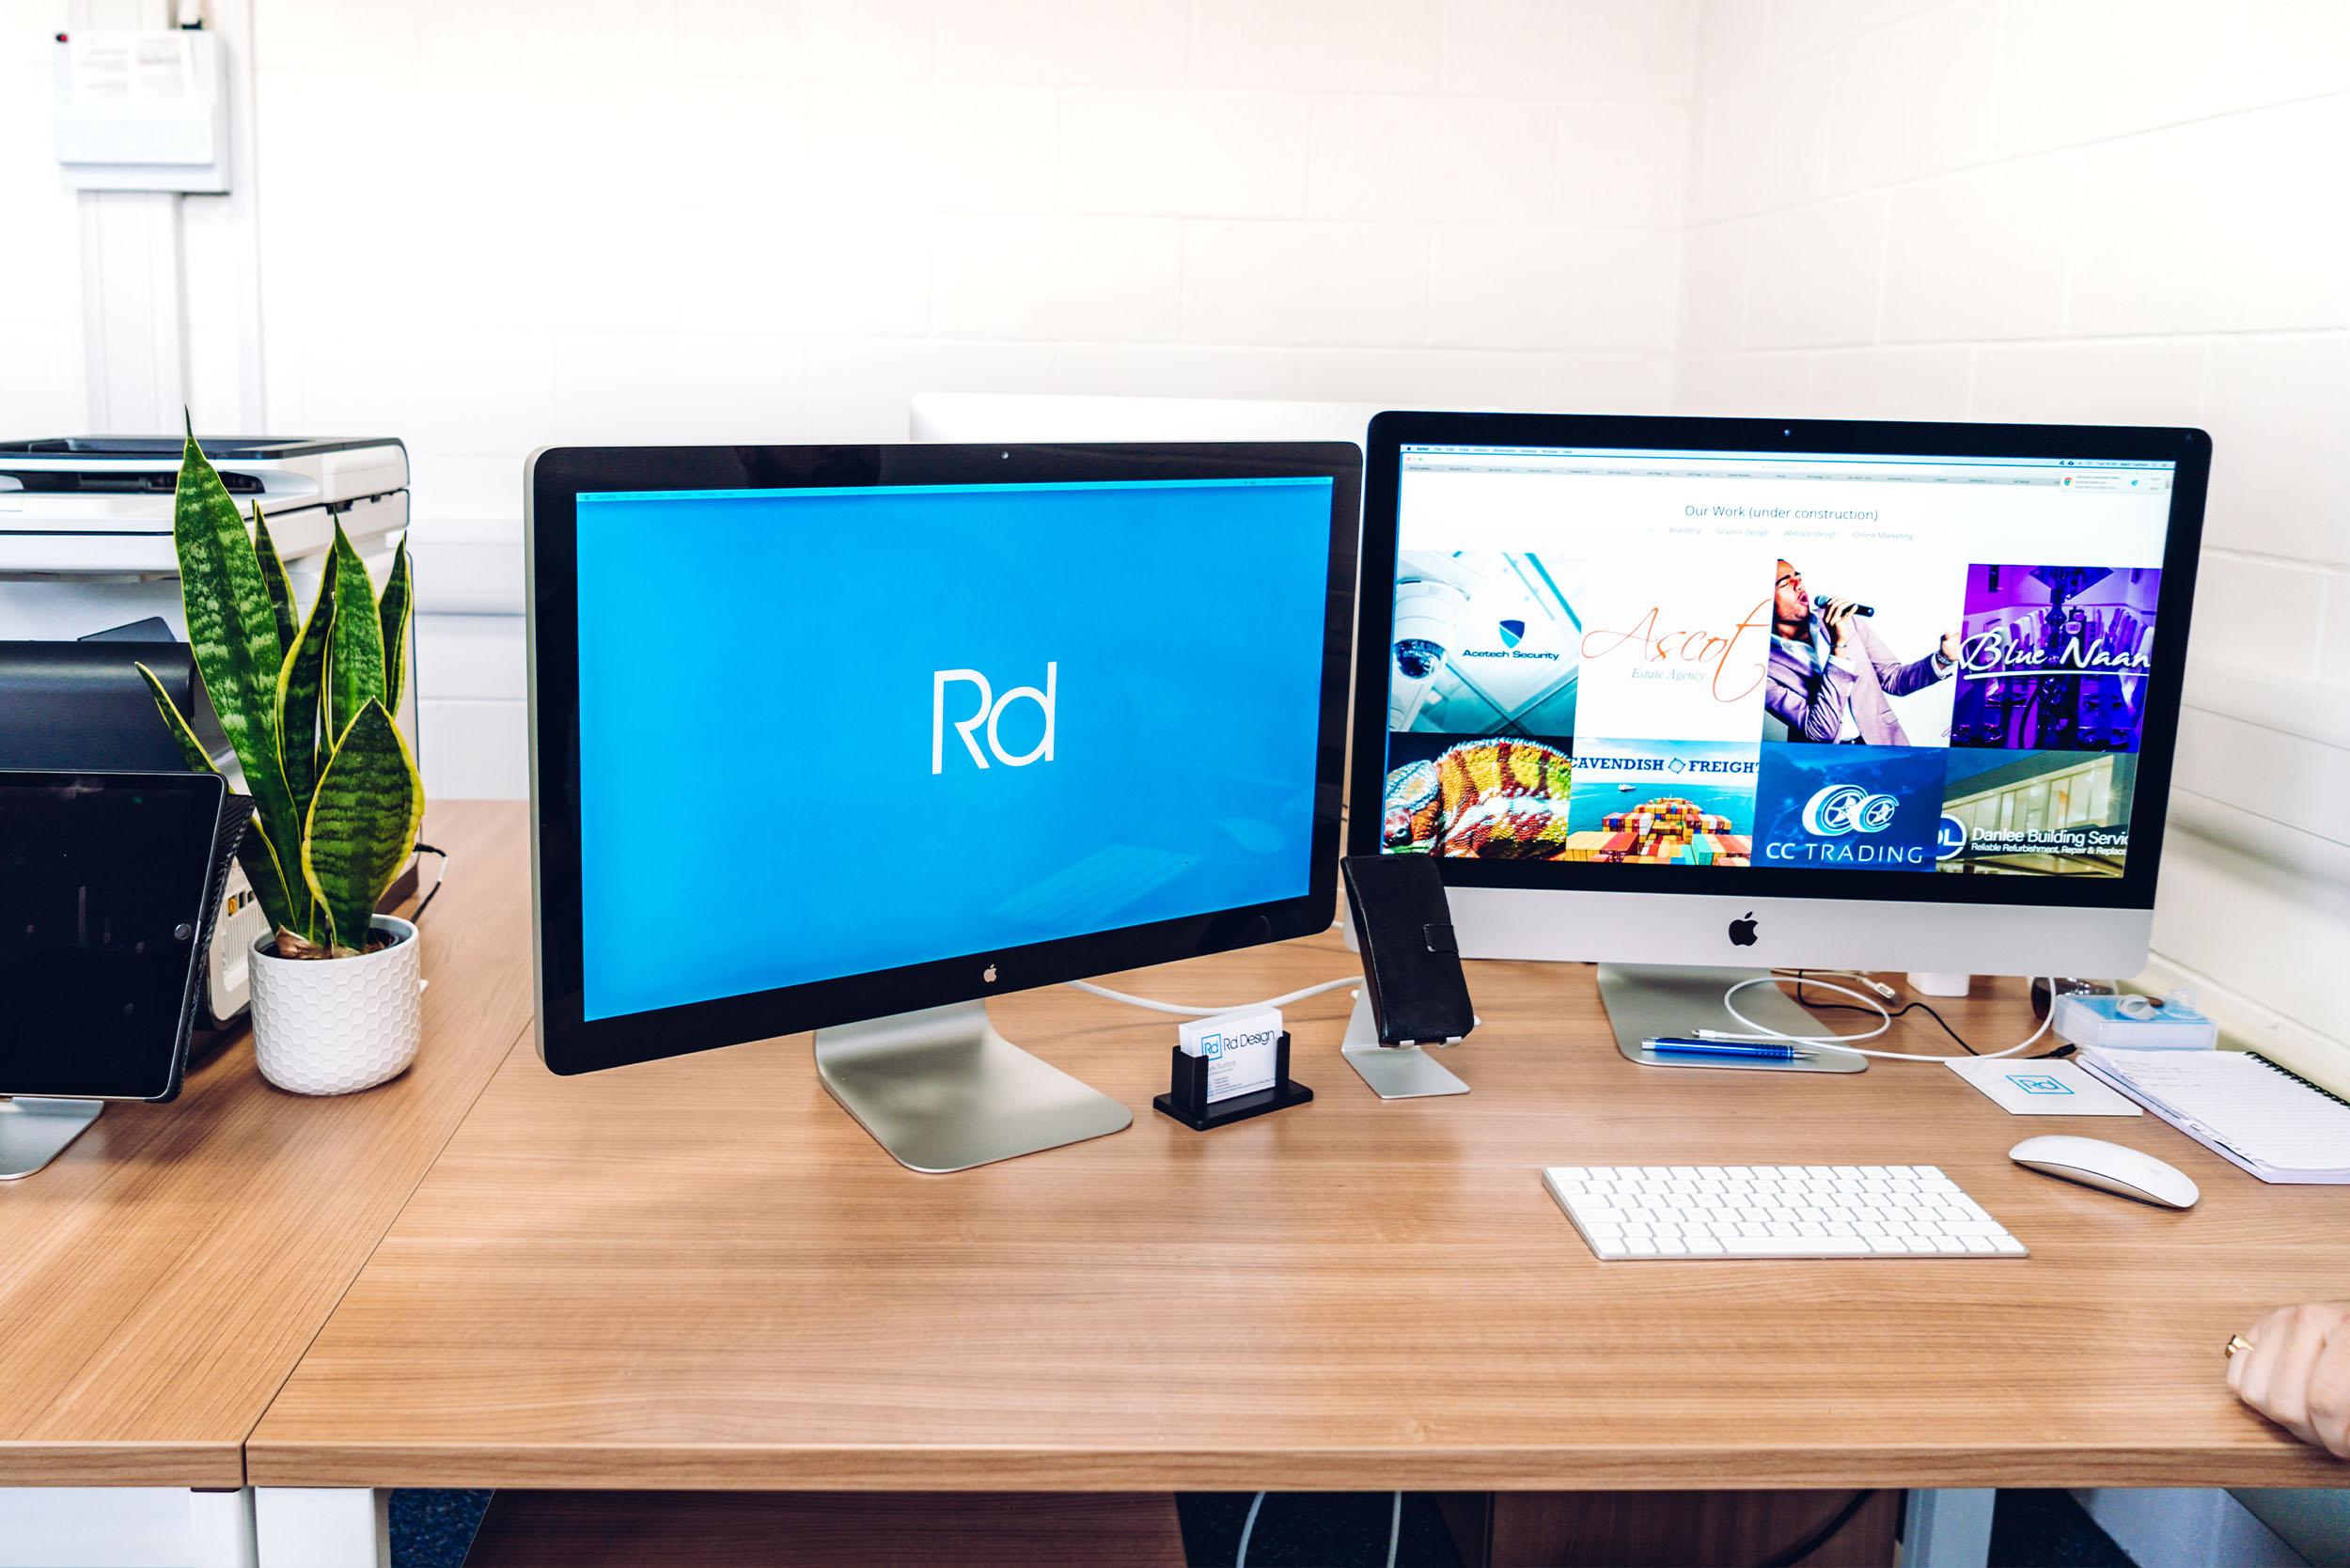 Rd Design - Marketing and Design Studio - Colchester, Essex 3.jpg